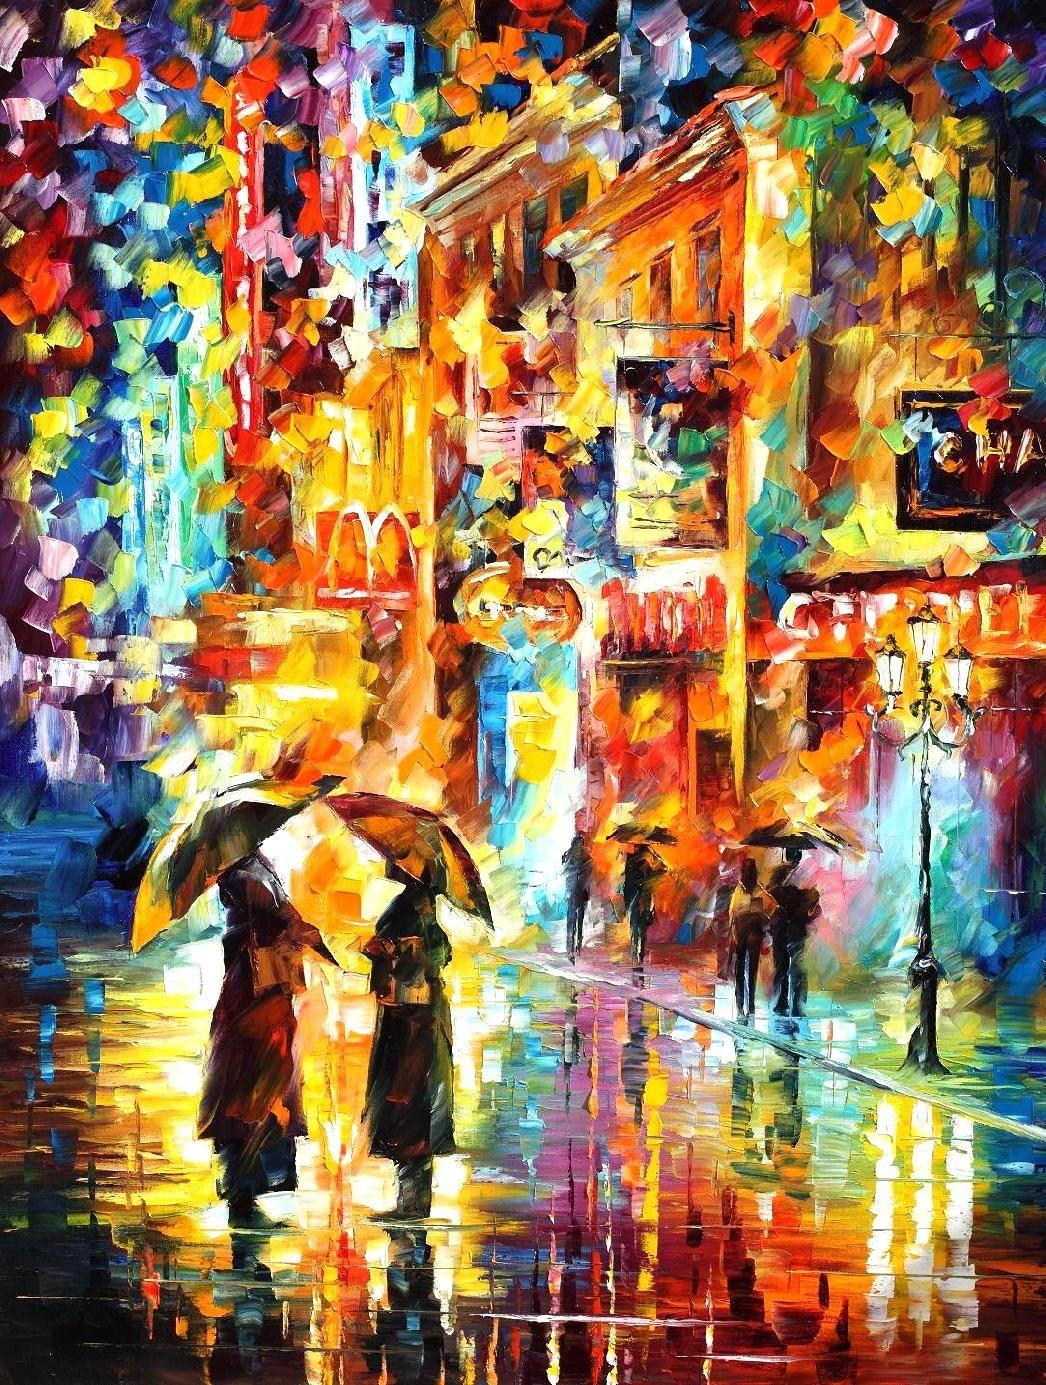 RAINY ENCOUNTER - Original Oil Painting On Canvas By Leonid Afremov http://afremov.com/TEA-TIME-Original-Oil-Painting-On-Canvas-By-Leonid-Afremov-30-X40-SKU18893.html?bid=1&partner=20921&utm_medium=/vpin&utm_campaign=v-ADD-YOUR&utm_source=s-vpin